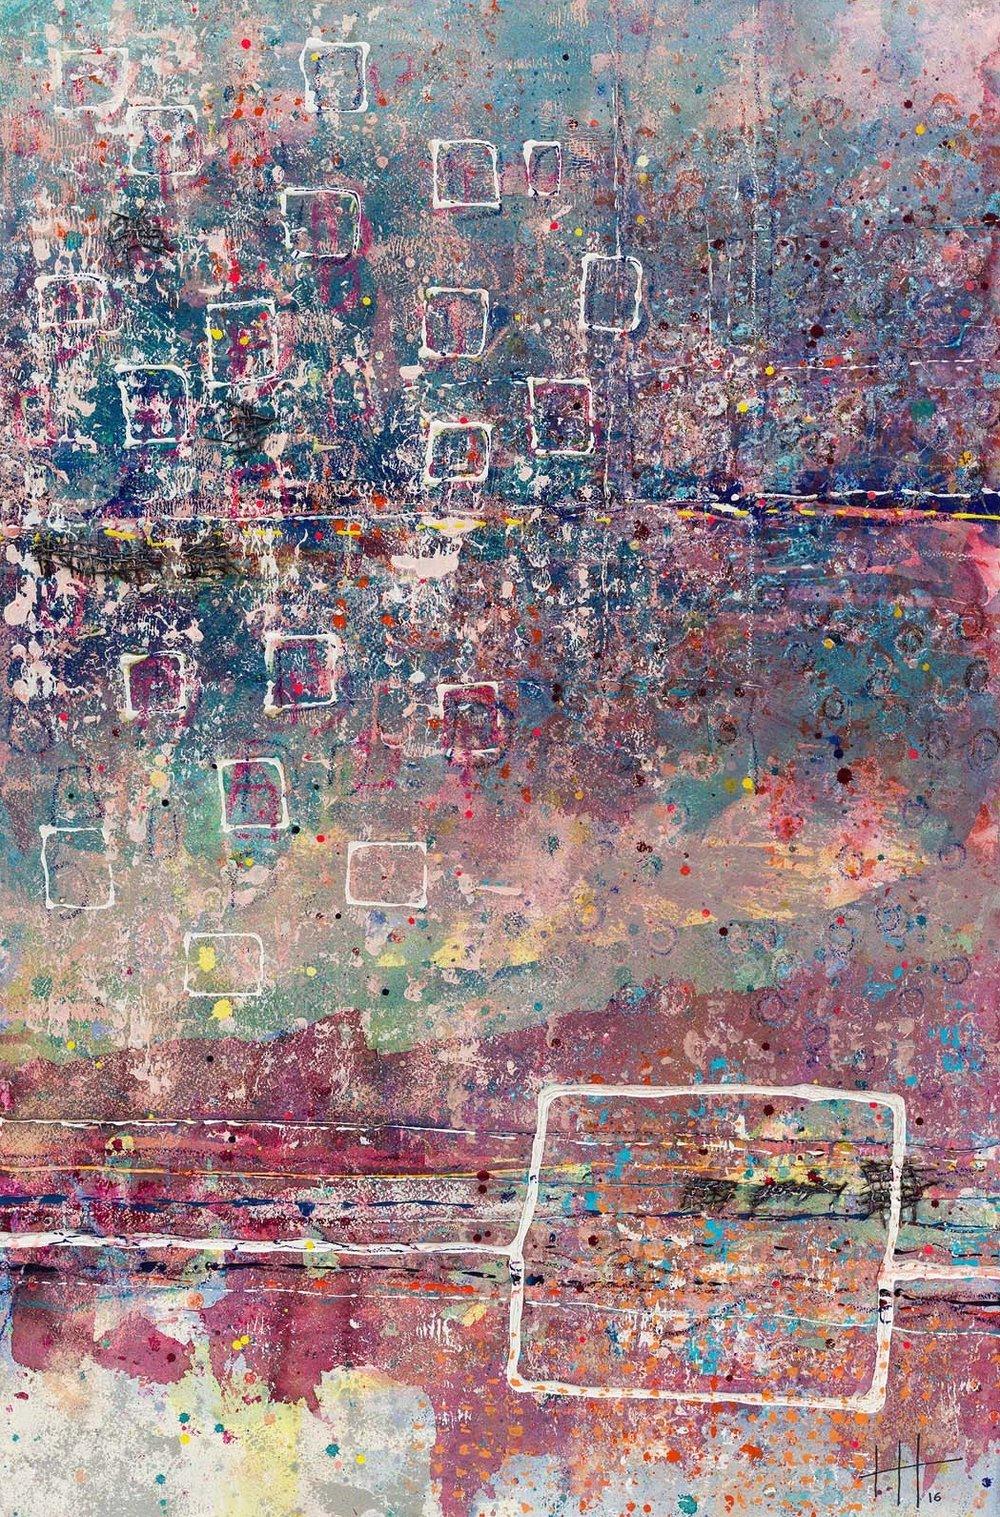 'Evening Walk' Acrylic & Mixed Media / 129cm x 93cm (framed) £1,750